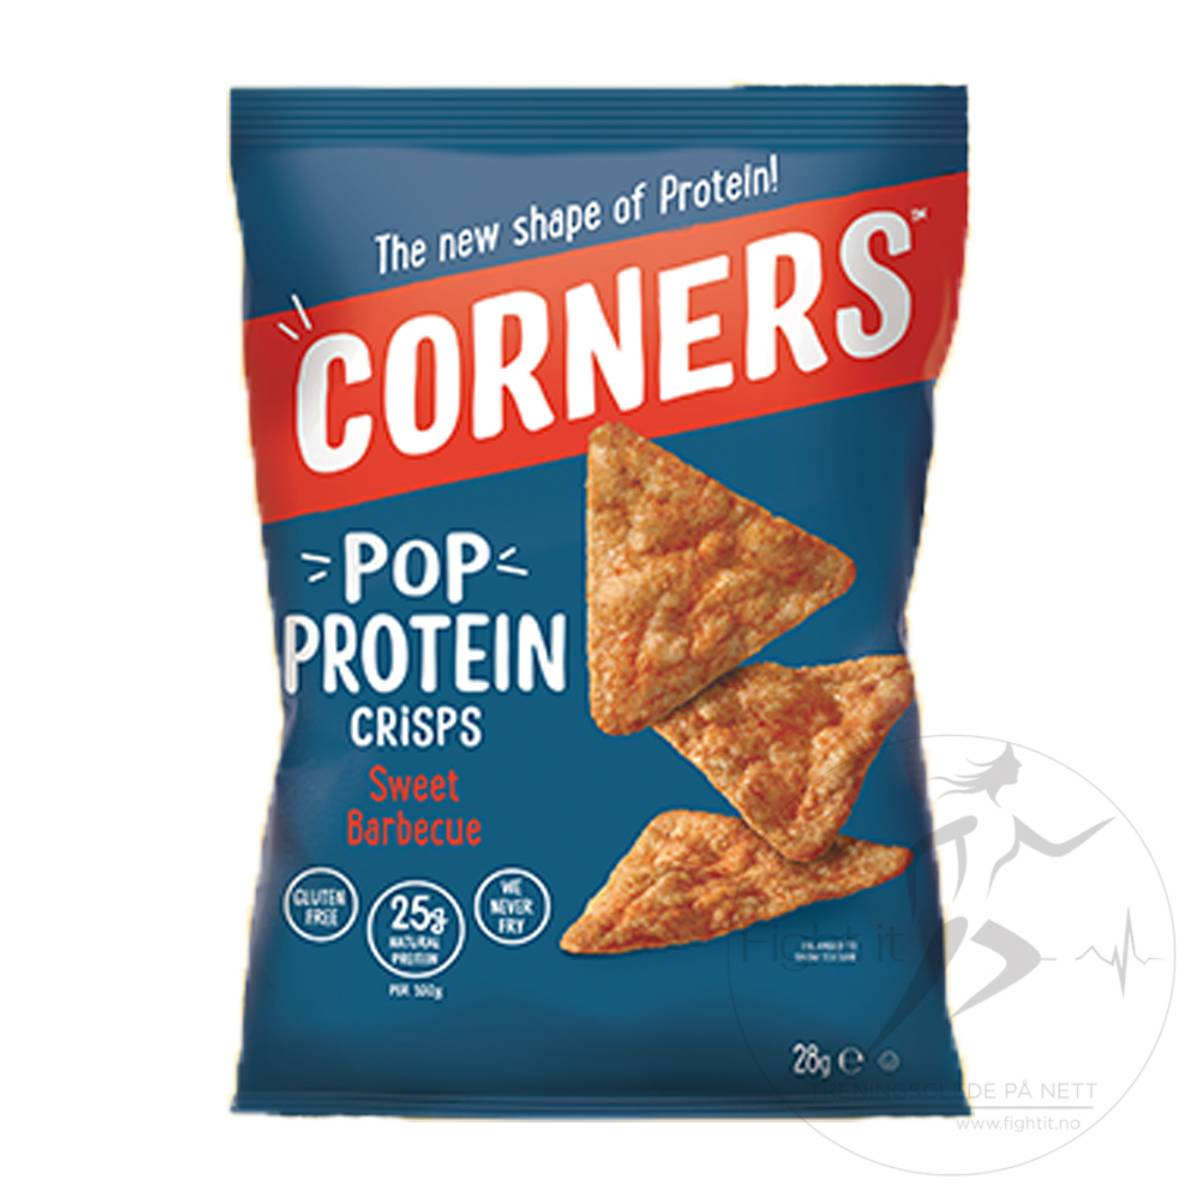 Corners - Pop Protein Crisps - Sweet BBQ 28g